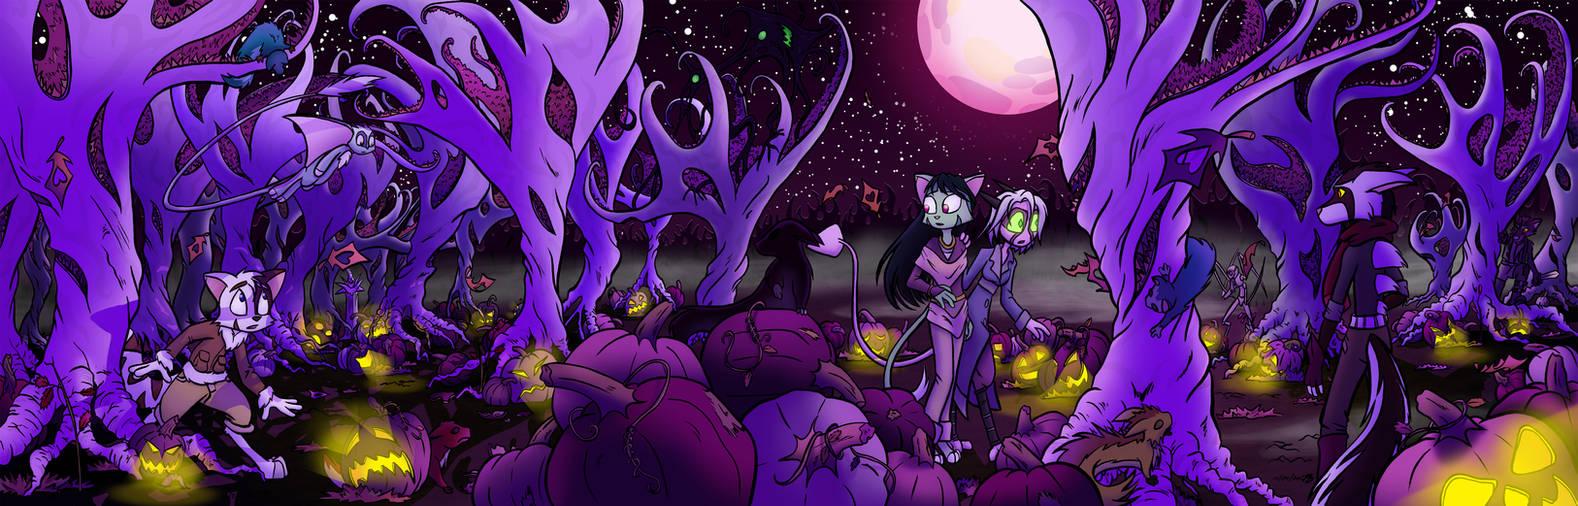 DK: Purple Forest